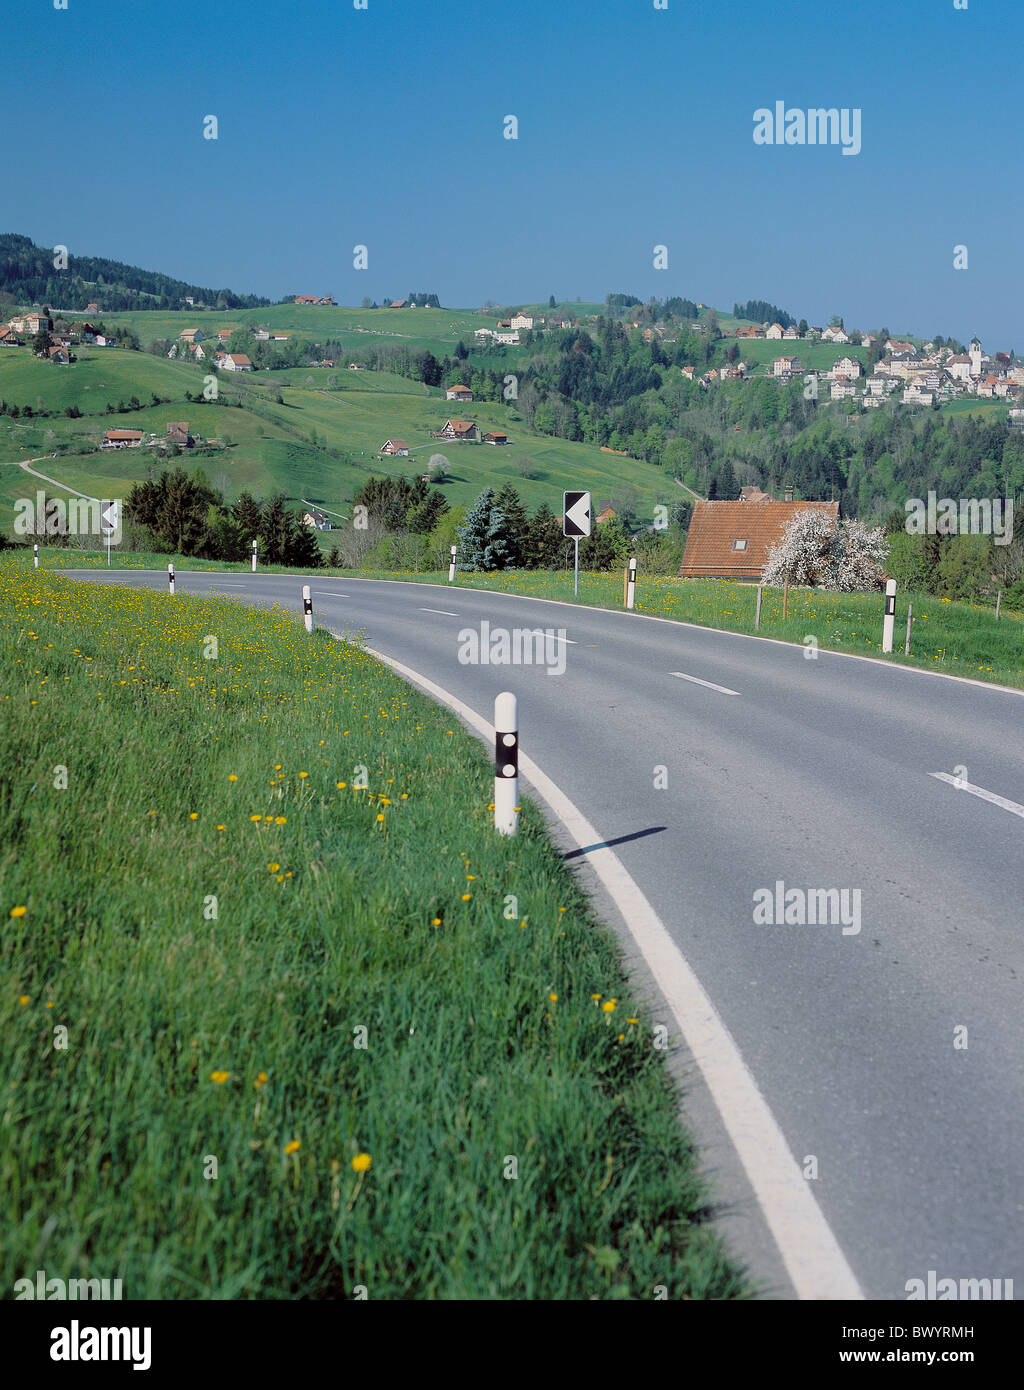 Landstraße Straße Schweiz Europa Appenzell hinter täuschen Landschaft Stockbild